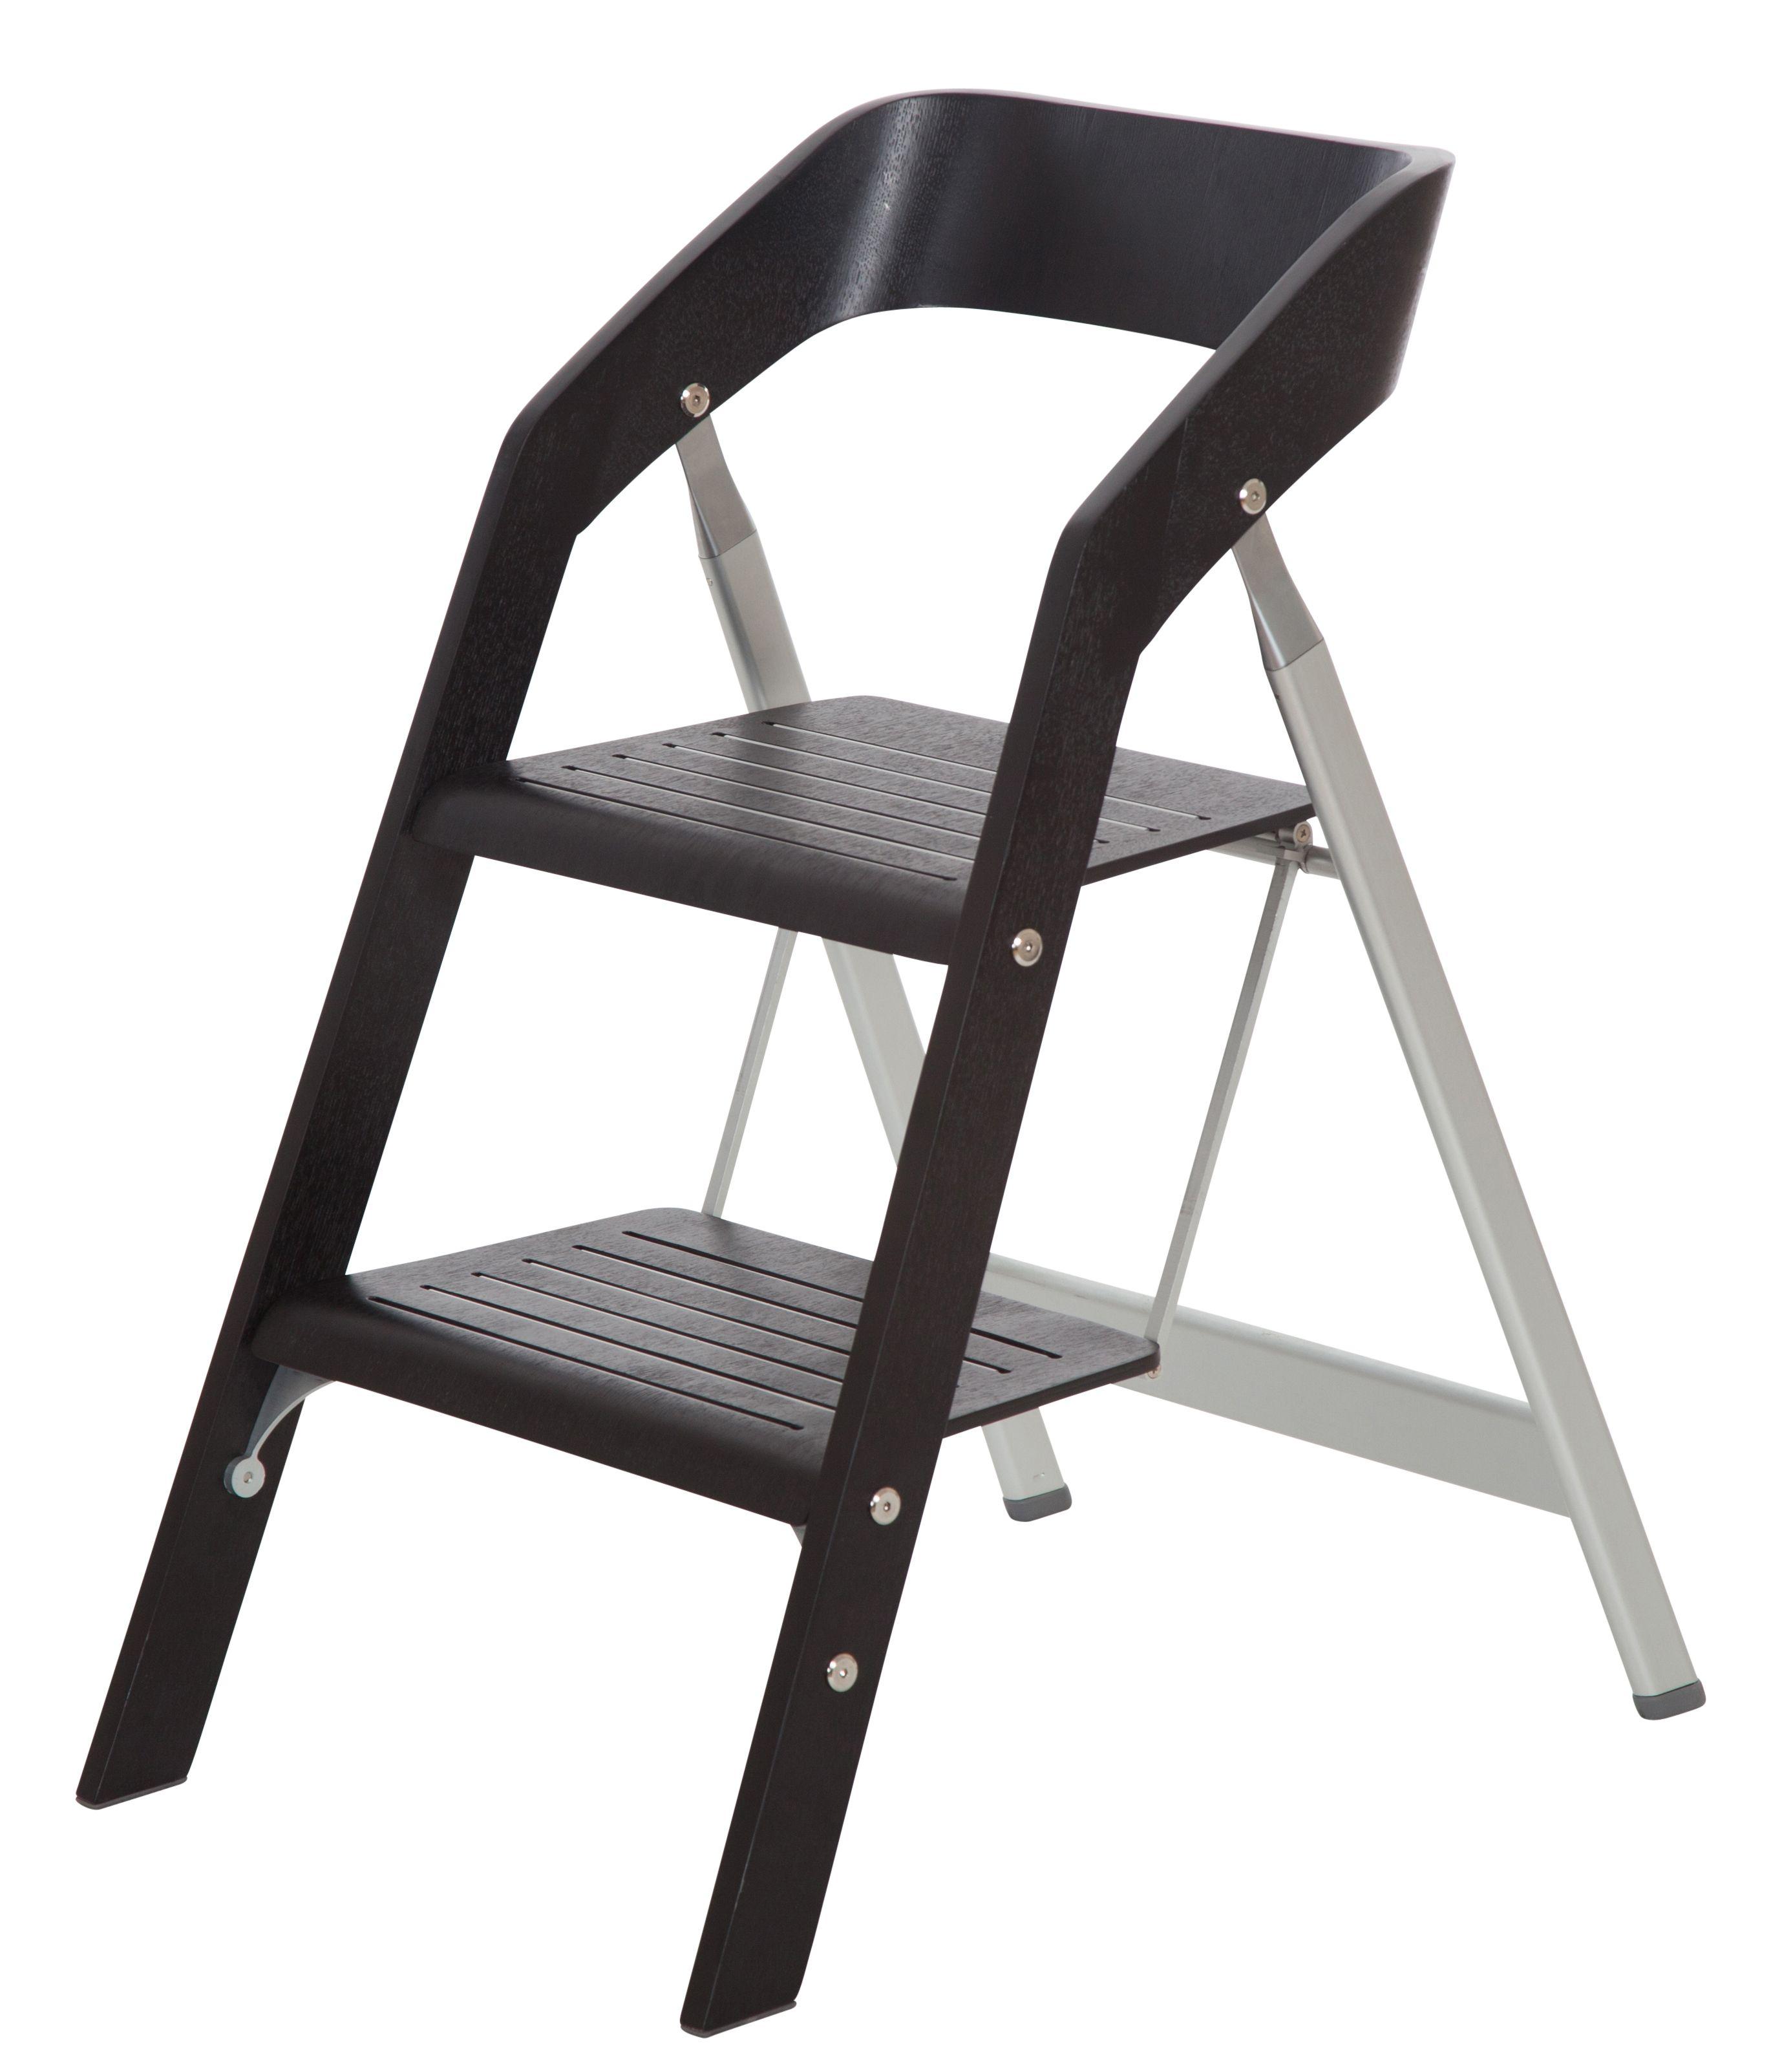 Outstanding Abru 2 Tread Wood Aluminium Step Stool 0 91M Departments Diy At Bq Bralicious Painted Fabric Chair Ideas Braliciousco